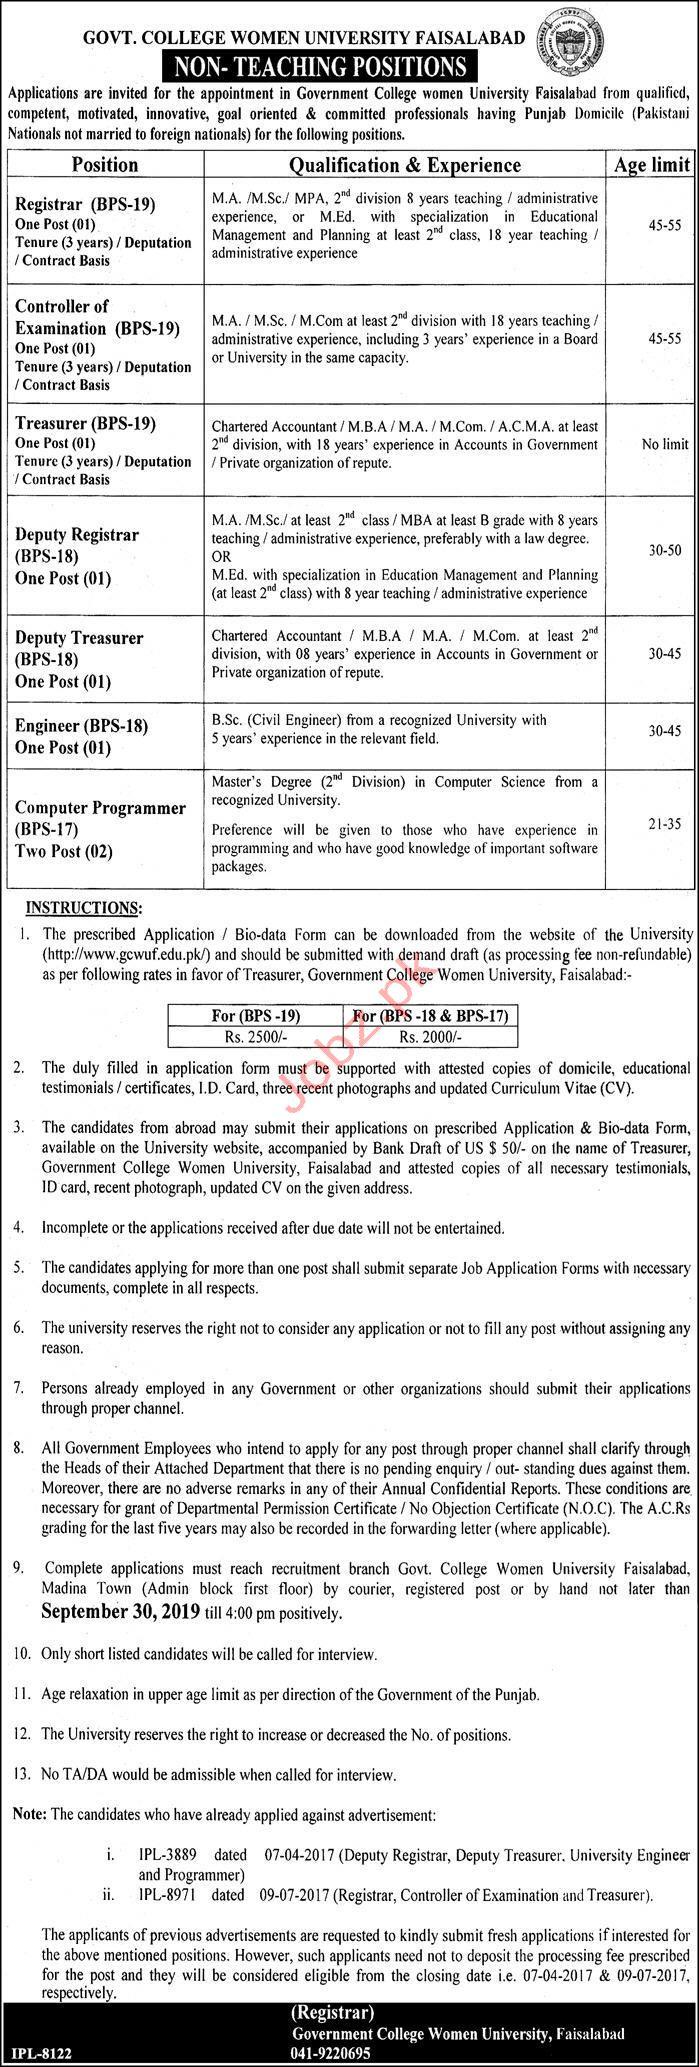 Government College Women University Faisalabad Jobs 2019 Job